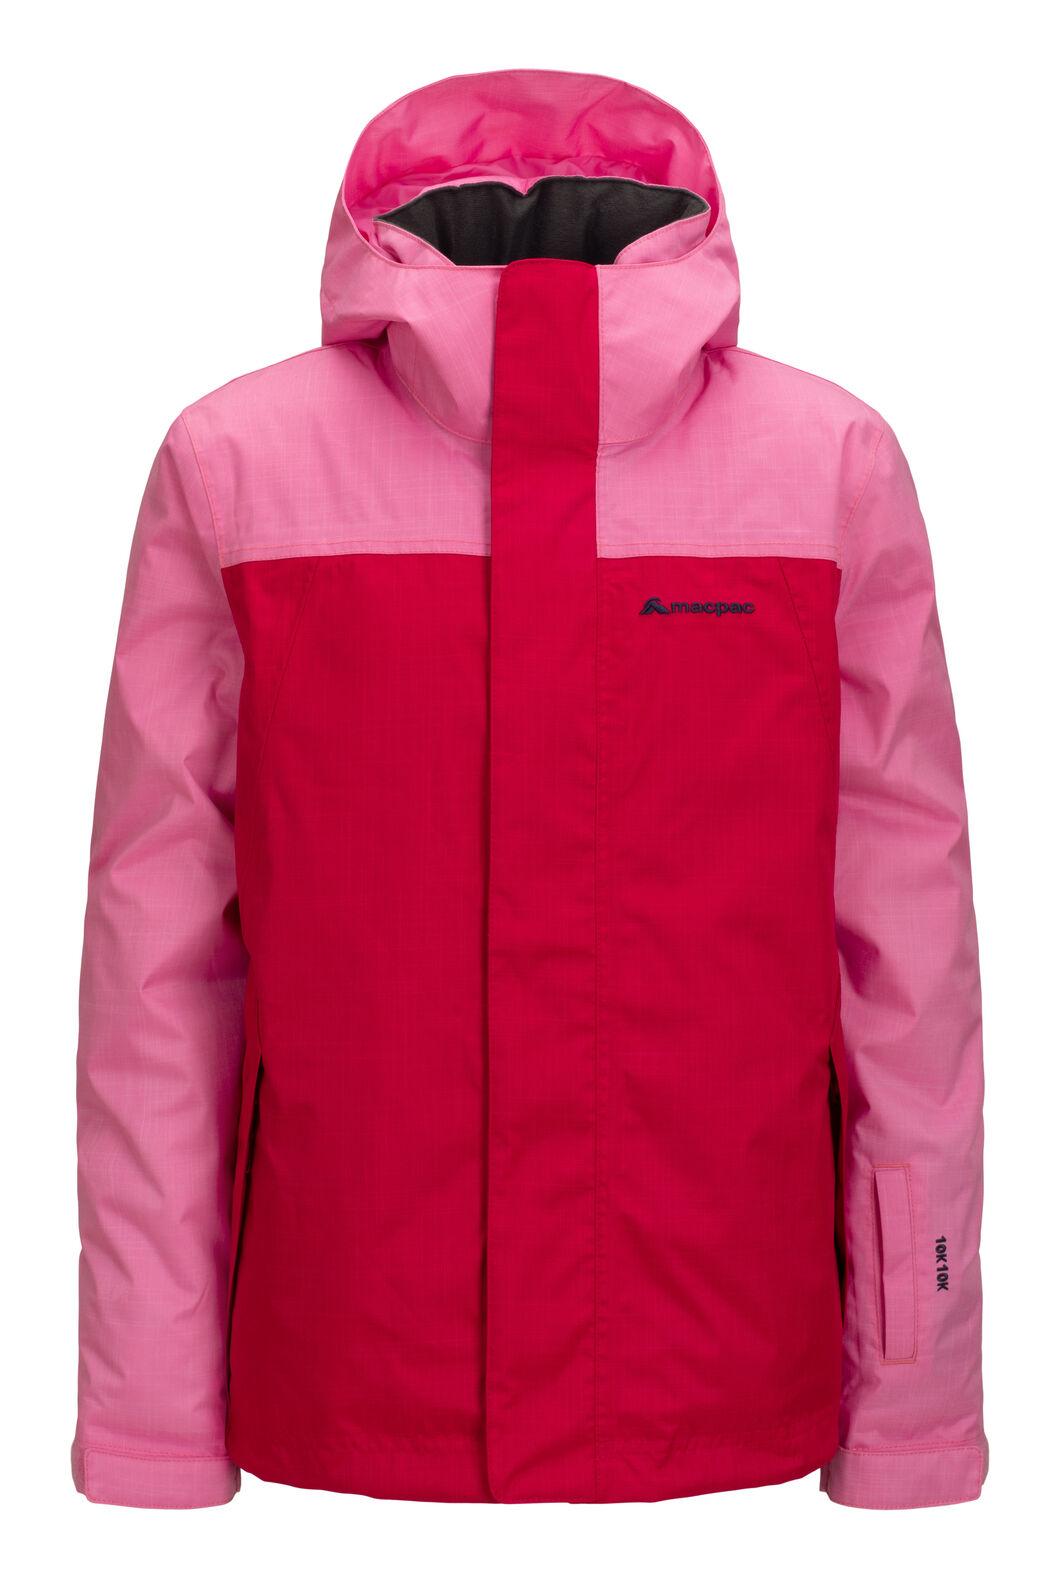 Macpac Kids' Spree Reflex™ Ski Jacket, Wild Orchid/Jazzy, hi-res